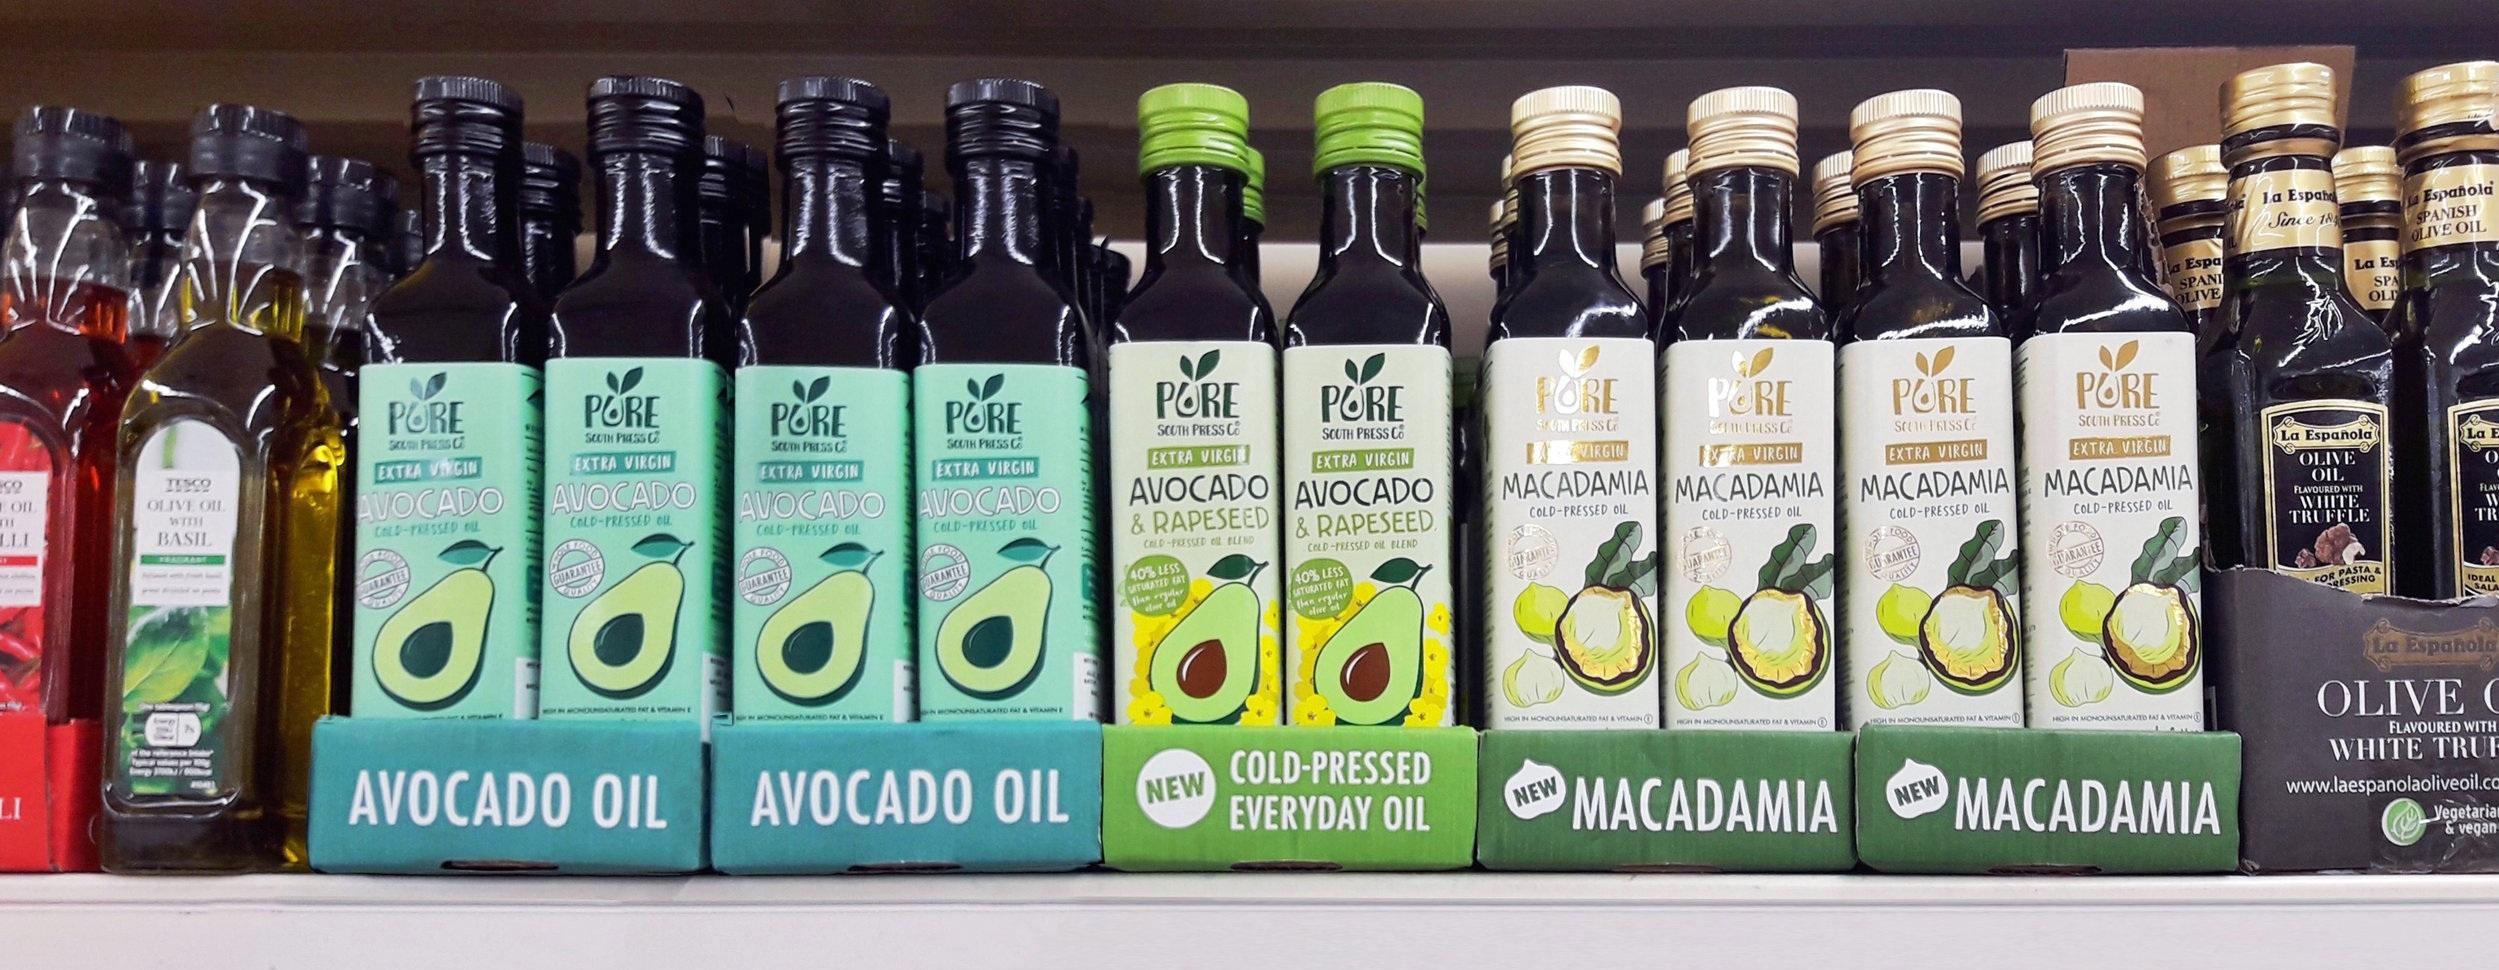 Pure South Press Avocado Oil Macadamia Oil In Tesco.jpg